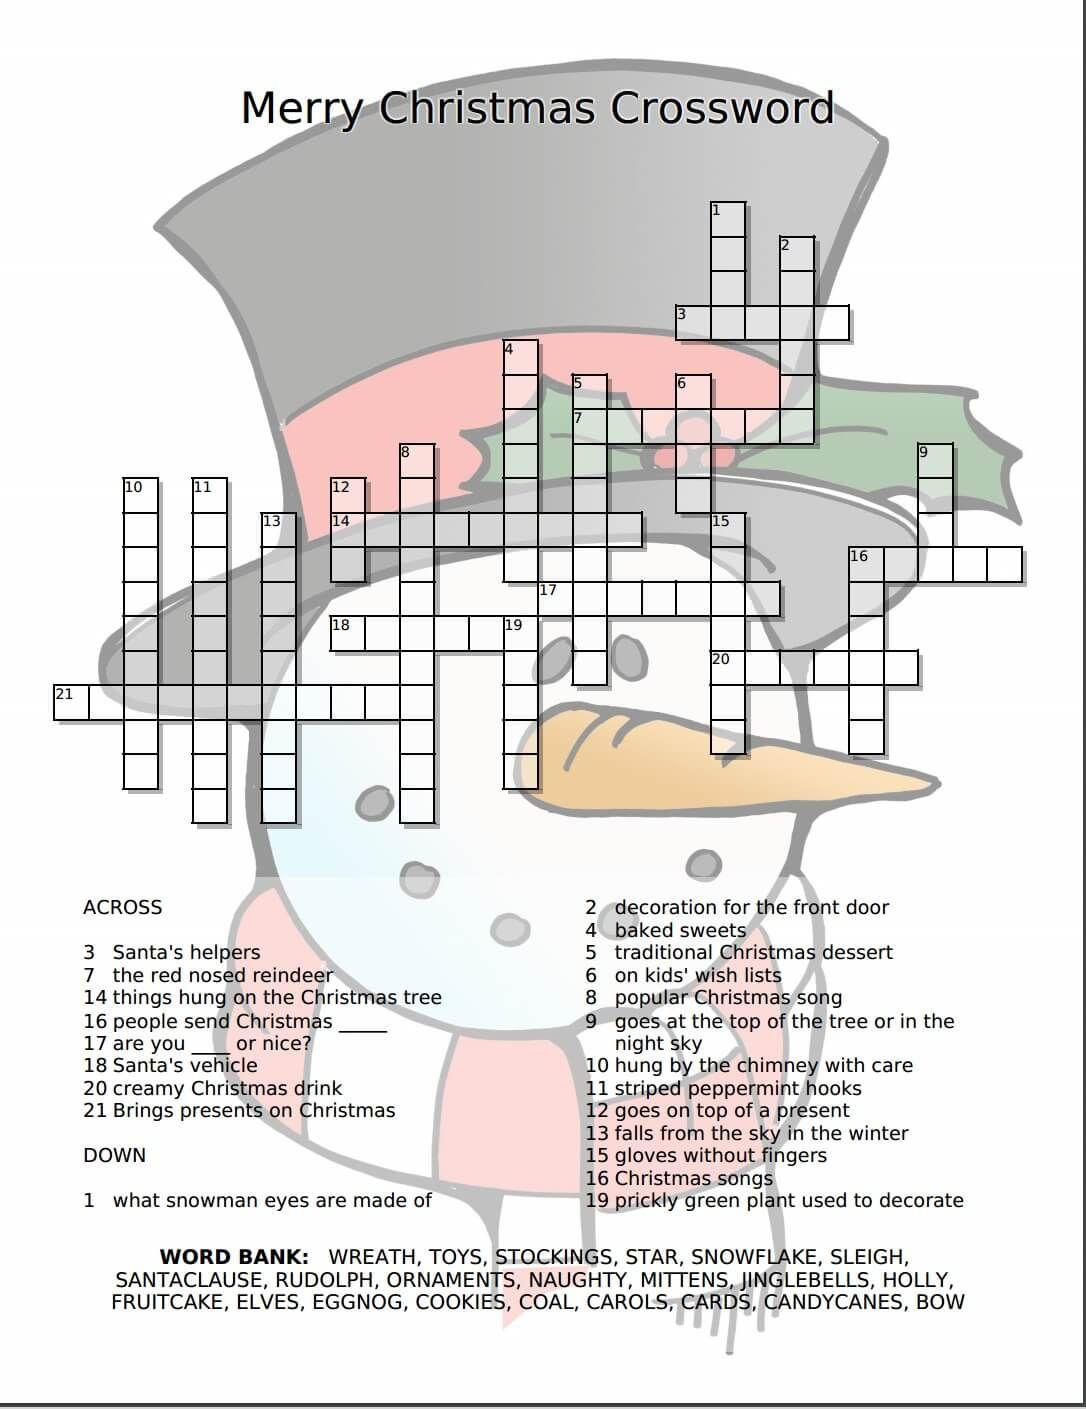 Merry Christmas Crossword Free Printable